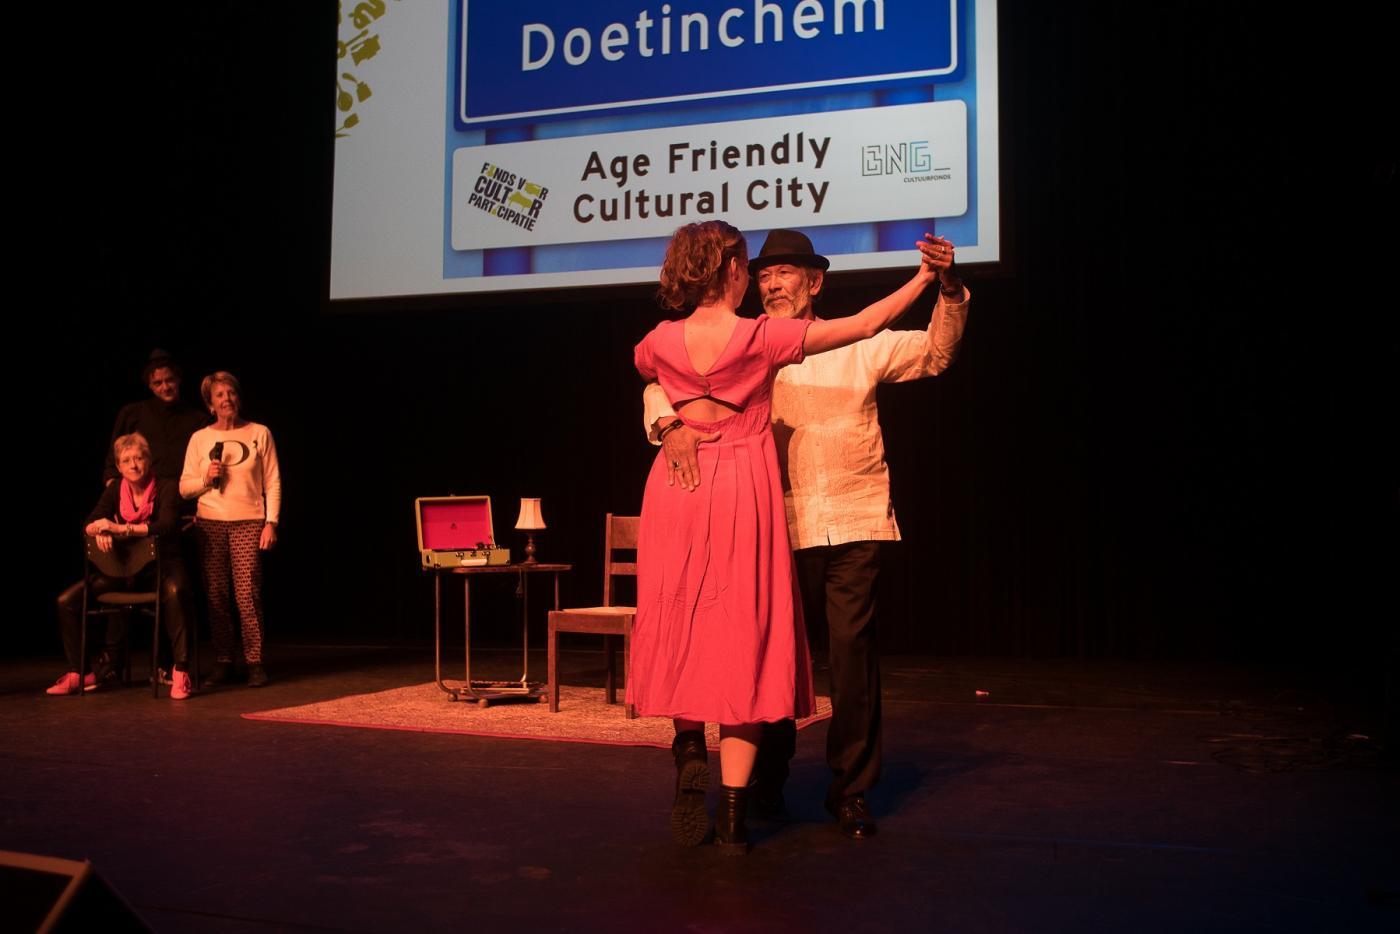 Ouderen uit Age Friendly Cultural Doetinchem dansen